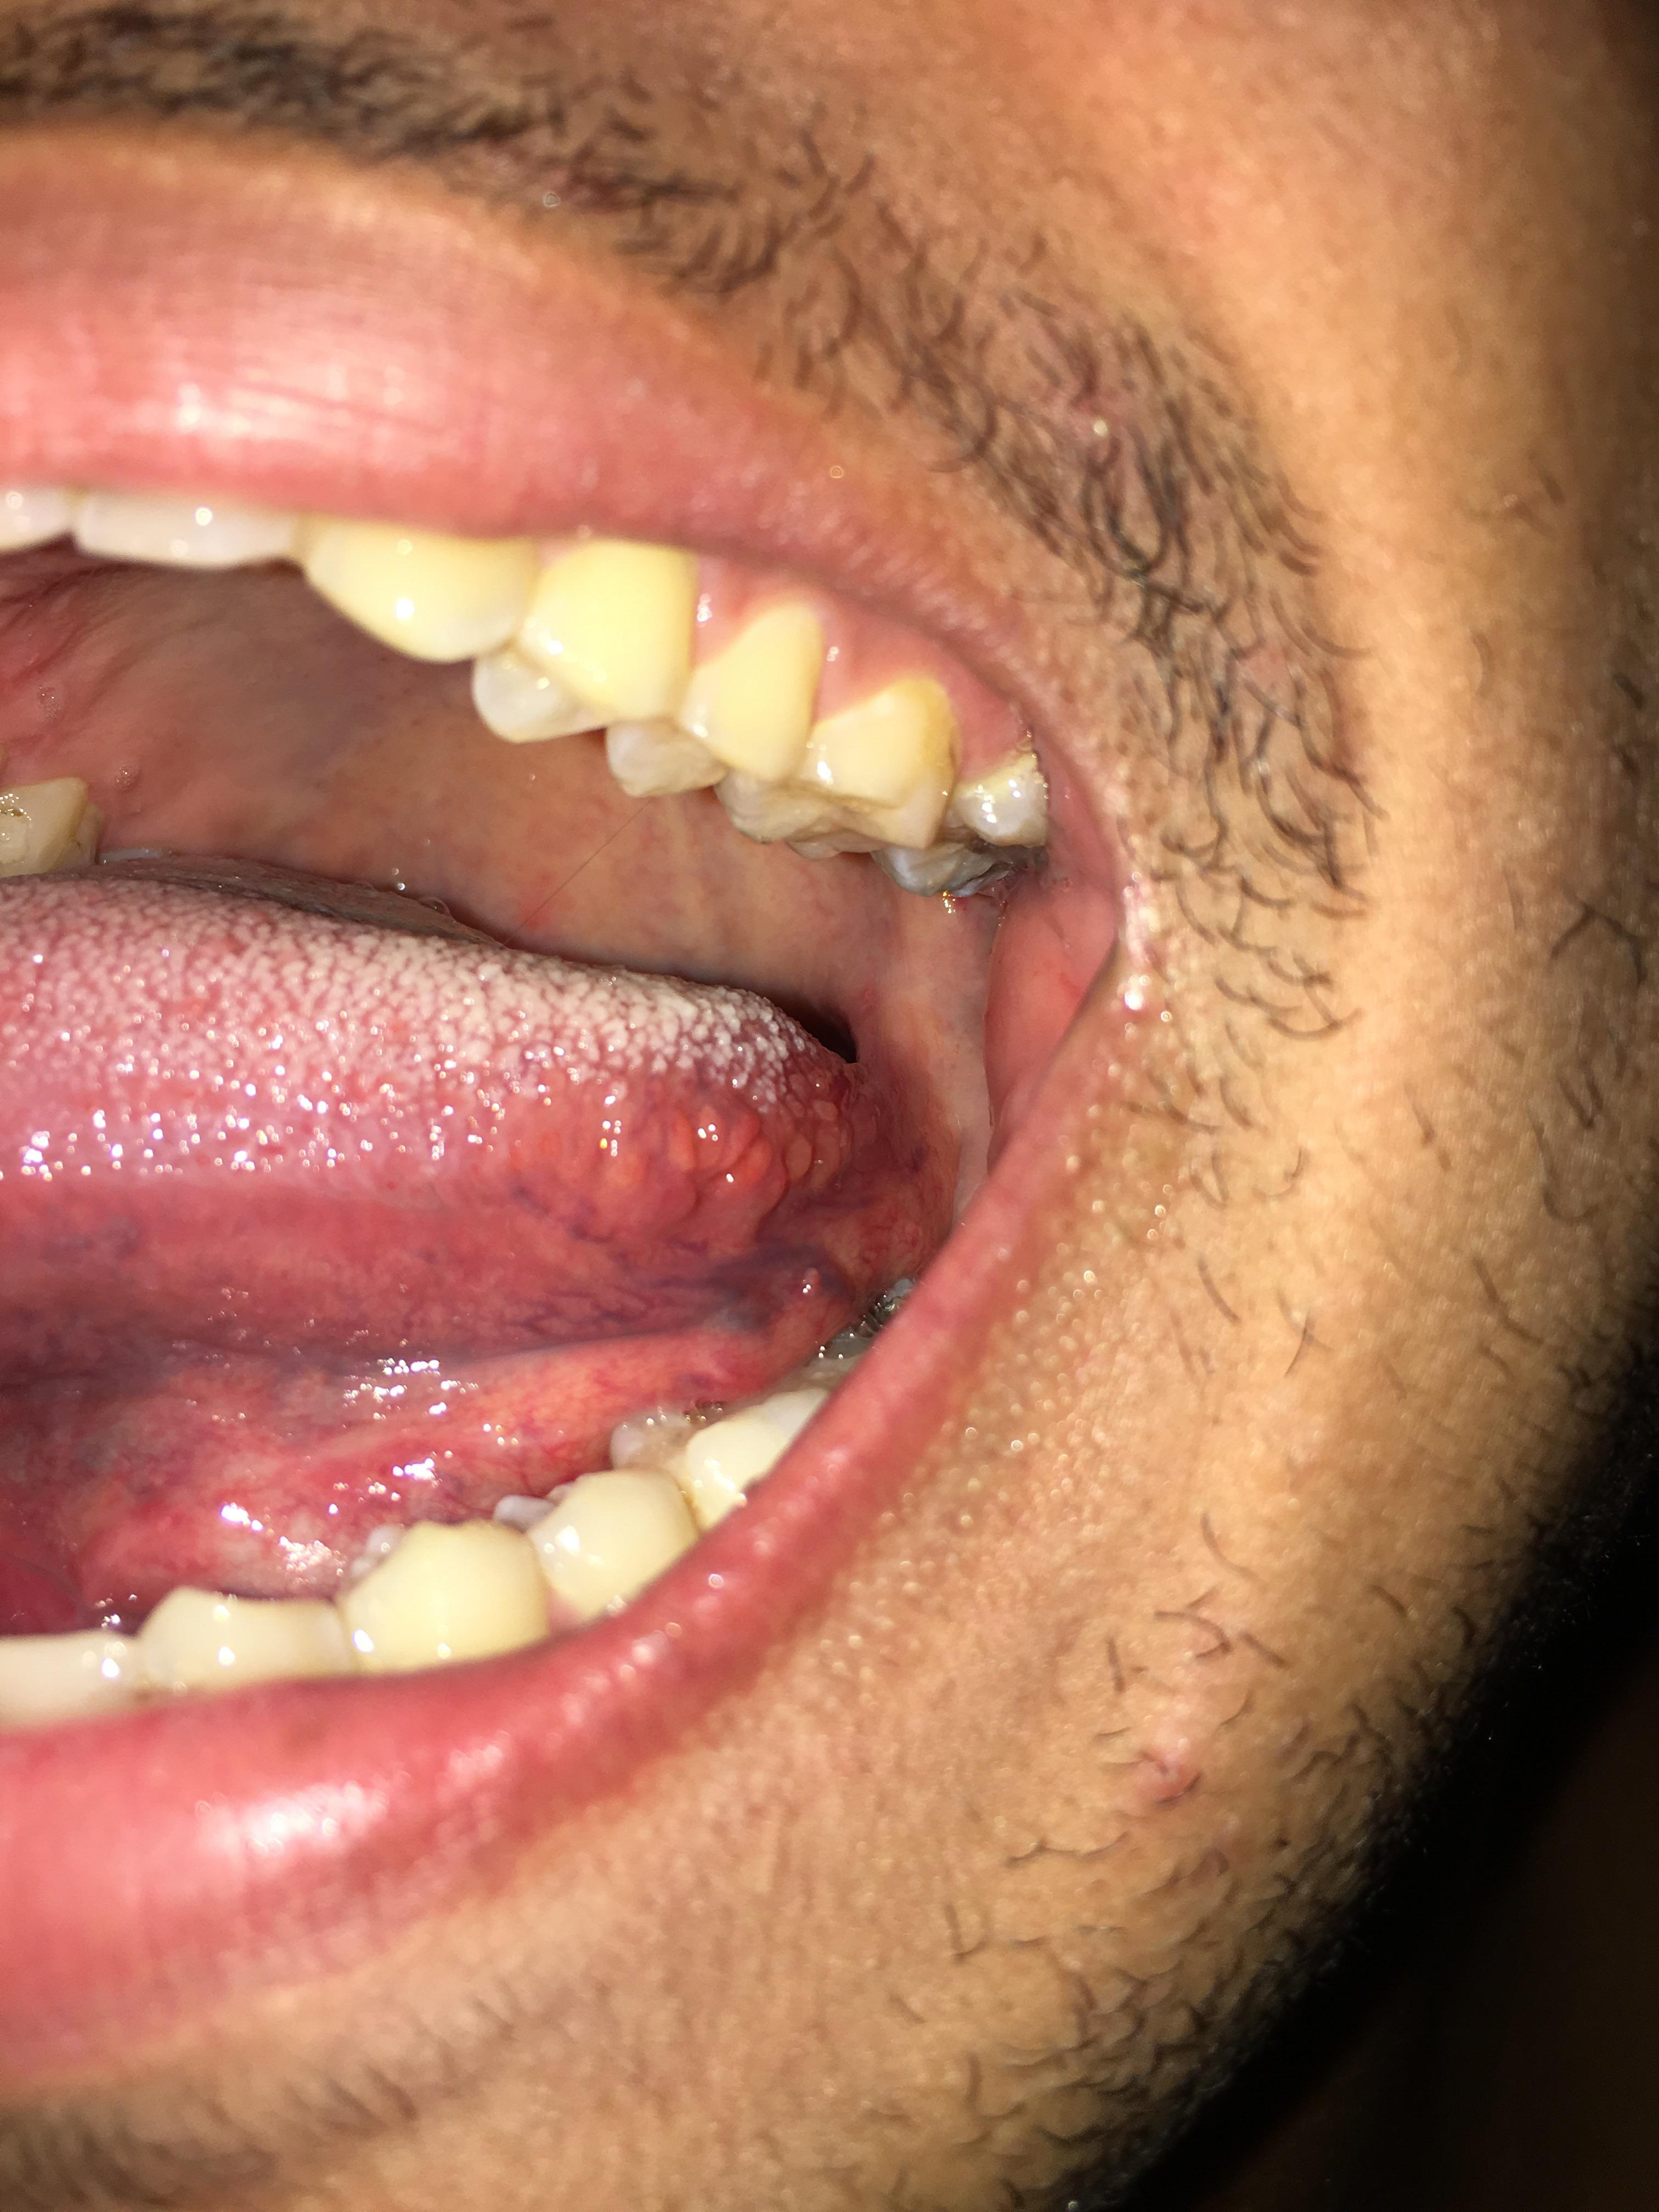 hpv genital warts reddit